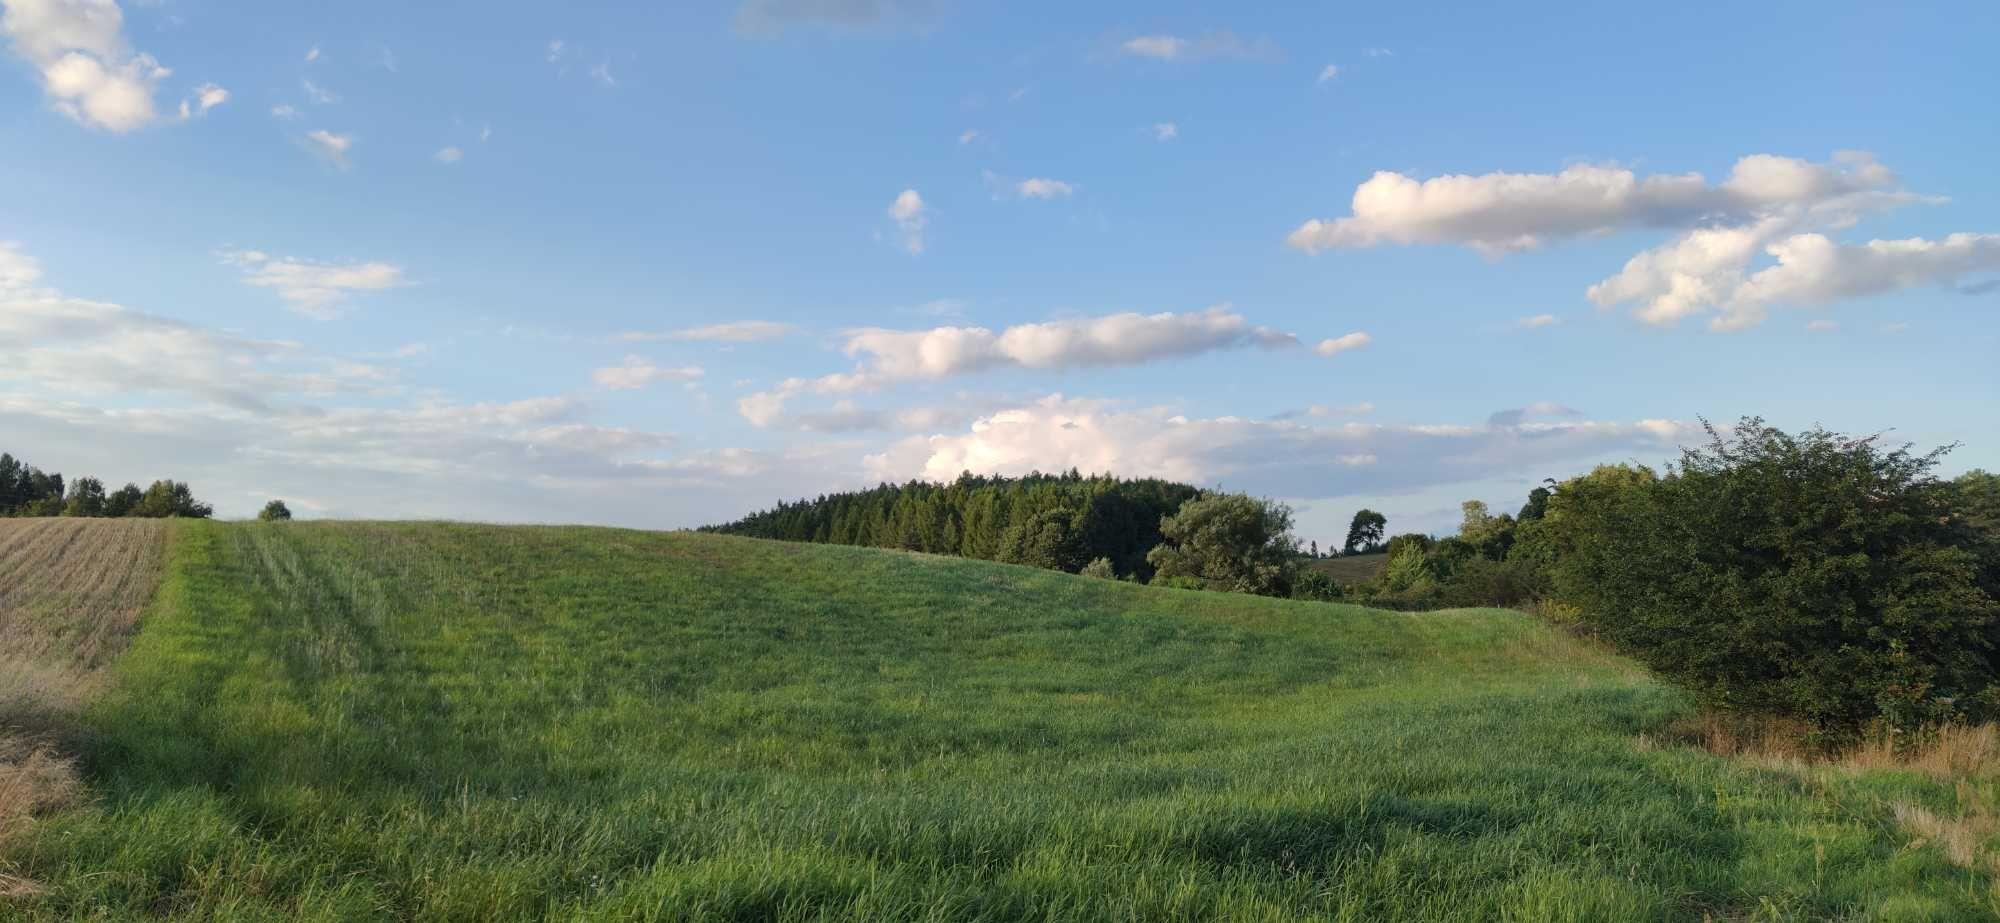 Działka rolna o pow. 1,6 ha